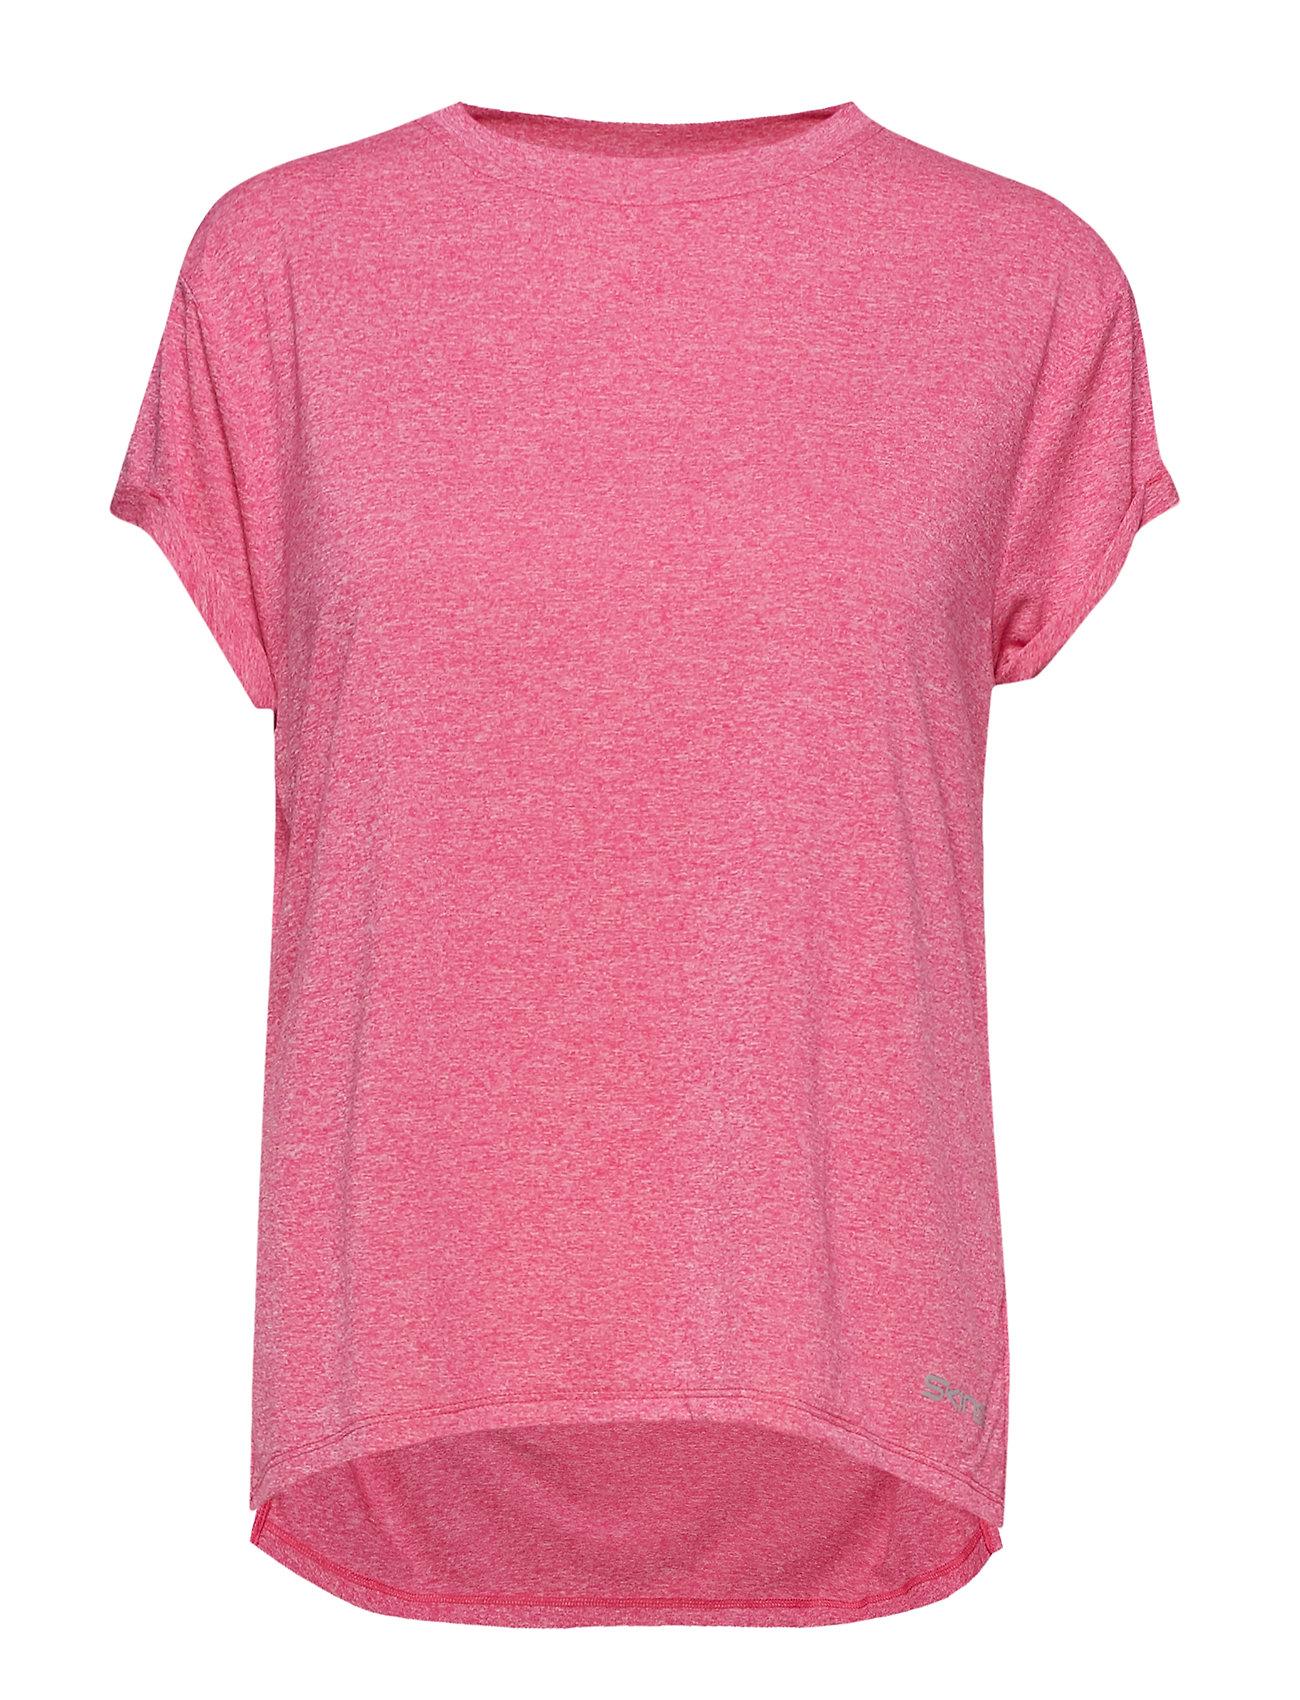 Skins Activewear Siken Womens T-Shirt - PINK MARLE